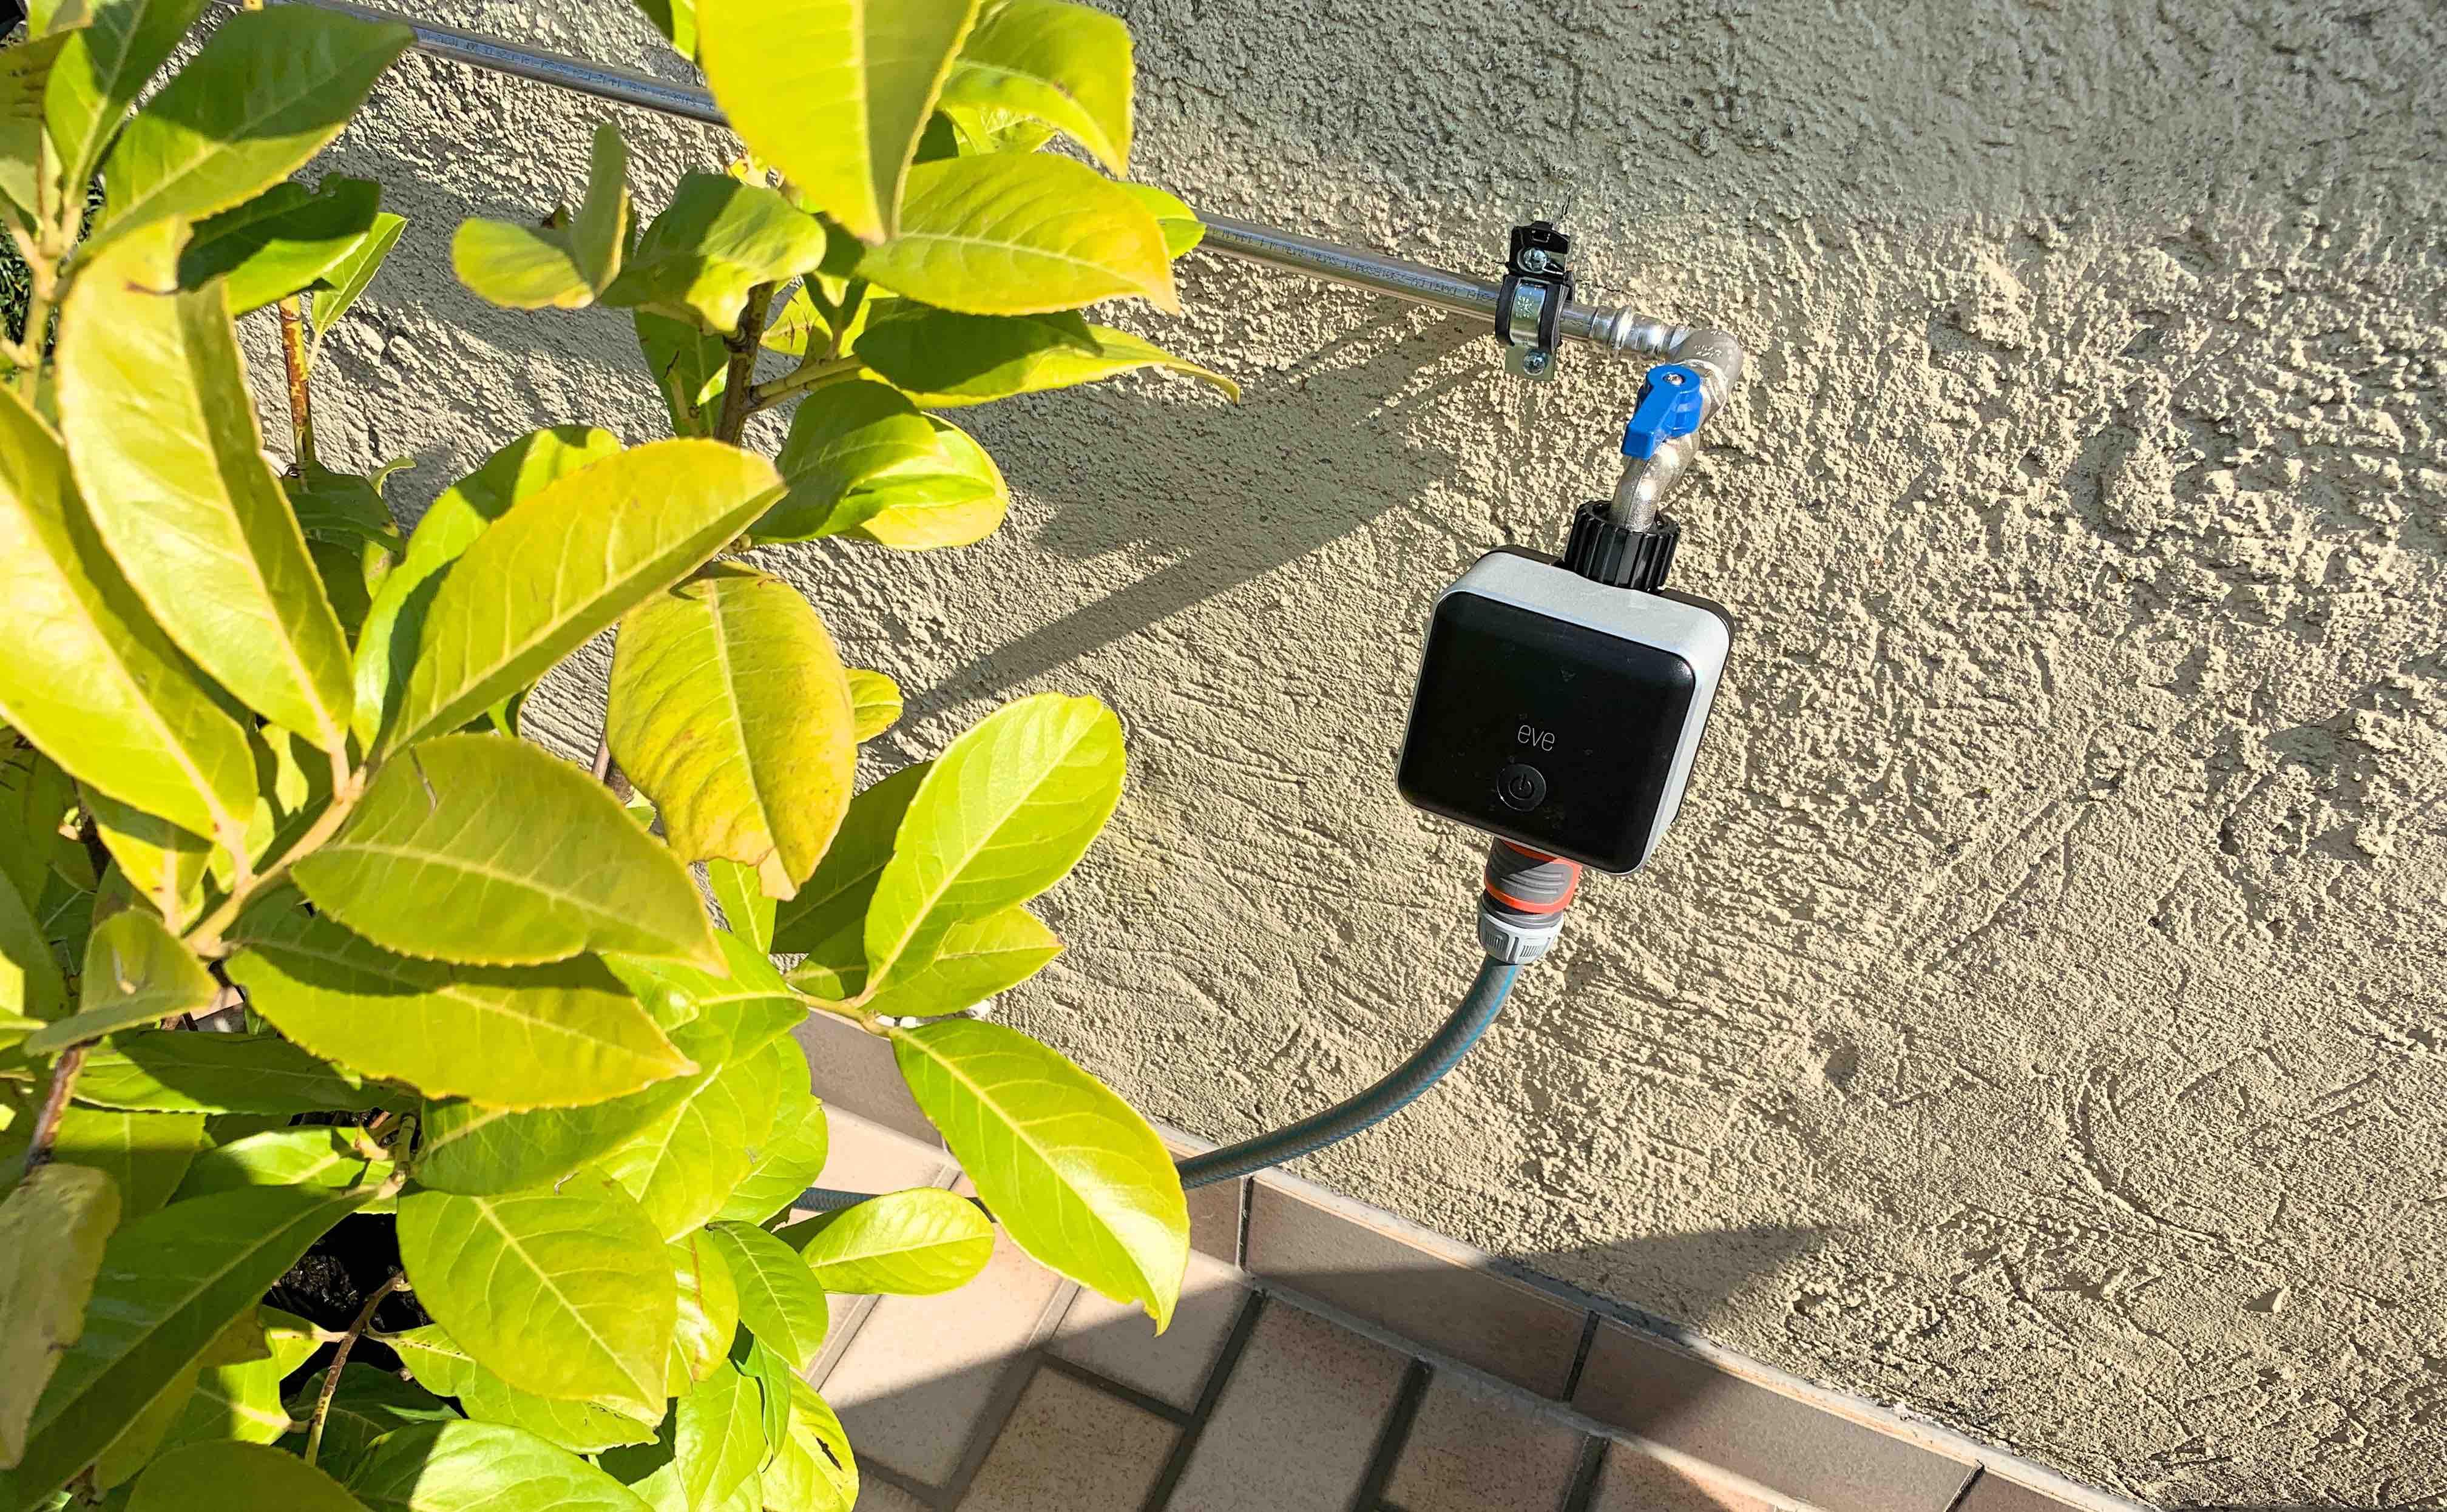 Eve_Aqua_HomeKit_Gardena_Terrasse_Balkon_Pflanzen_Bewässerung2 Wie HomeKit deine Pflanzen auf Balkon/Terrasse automatisiert bewässert